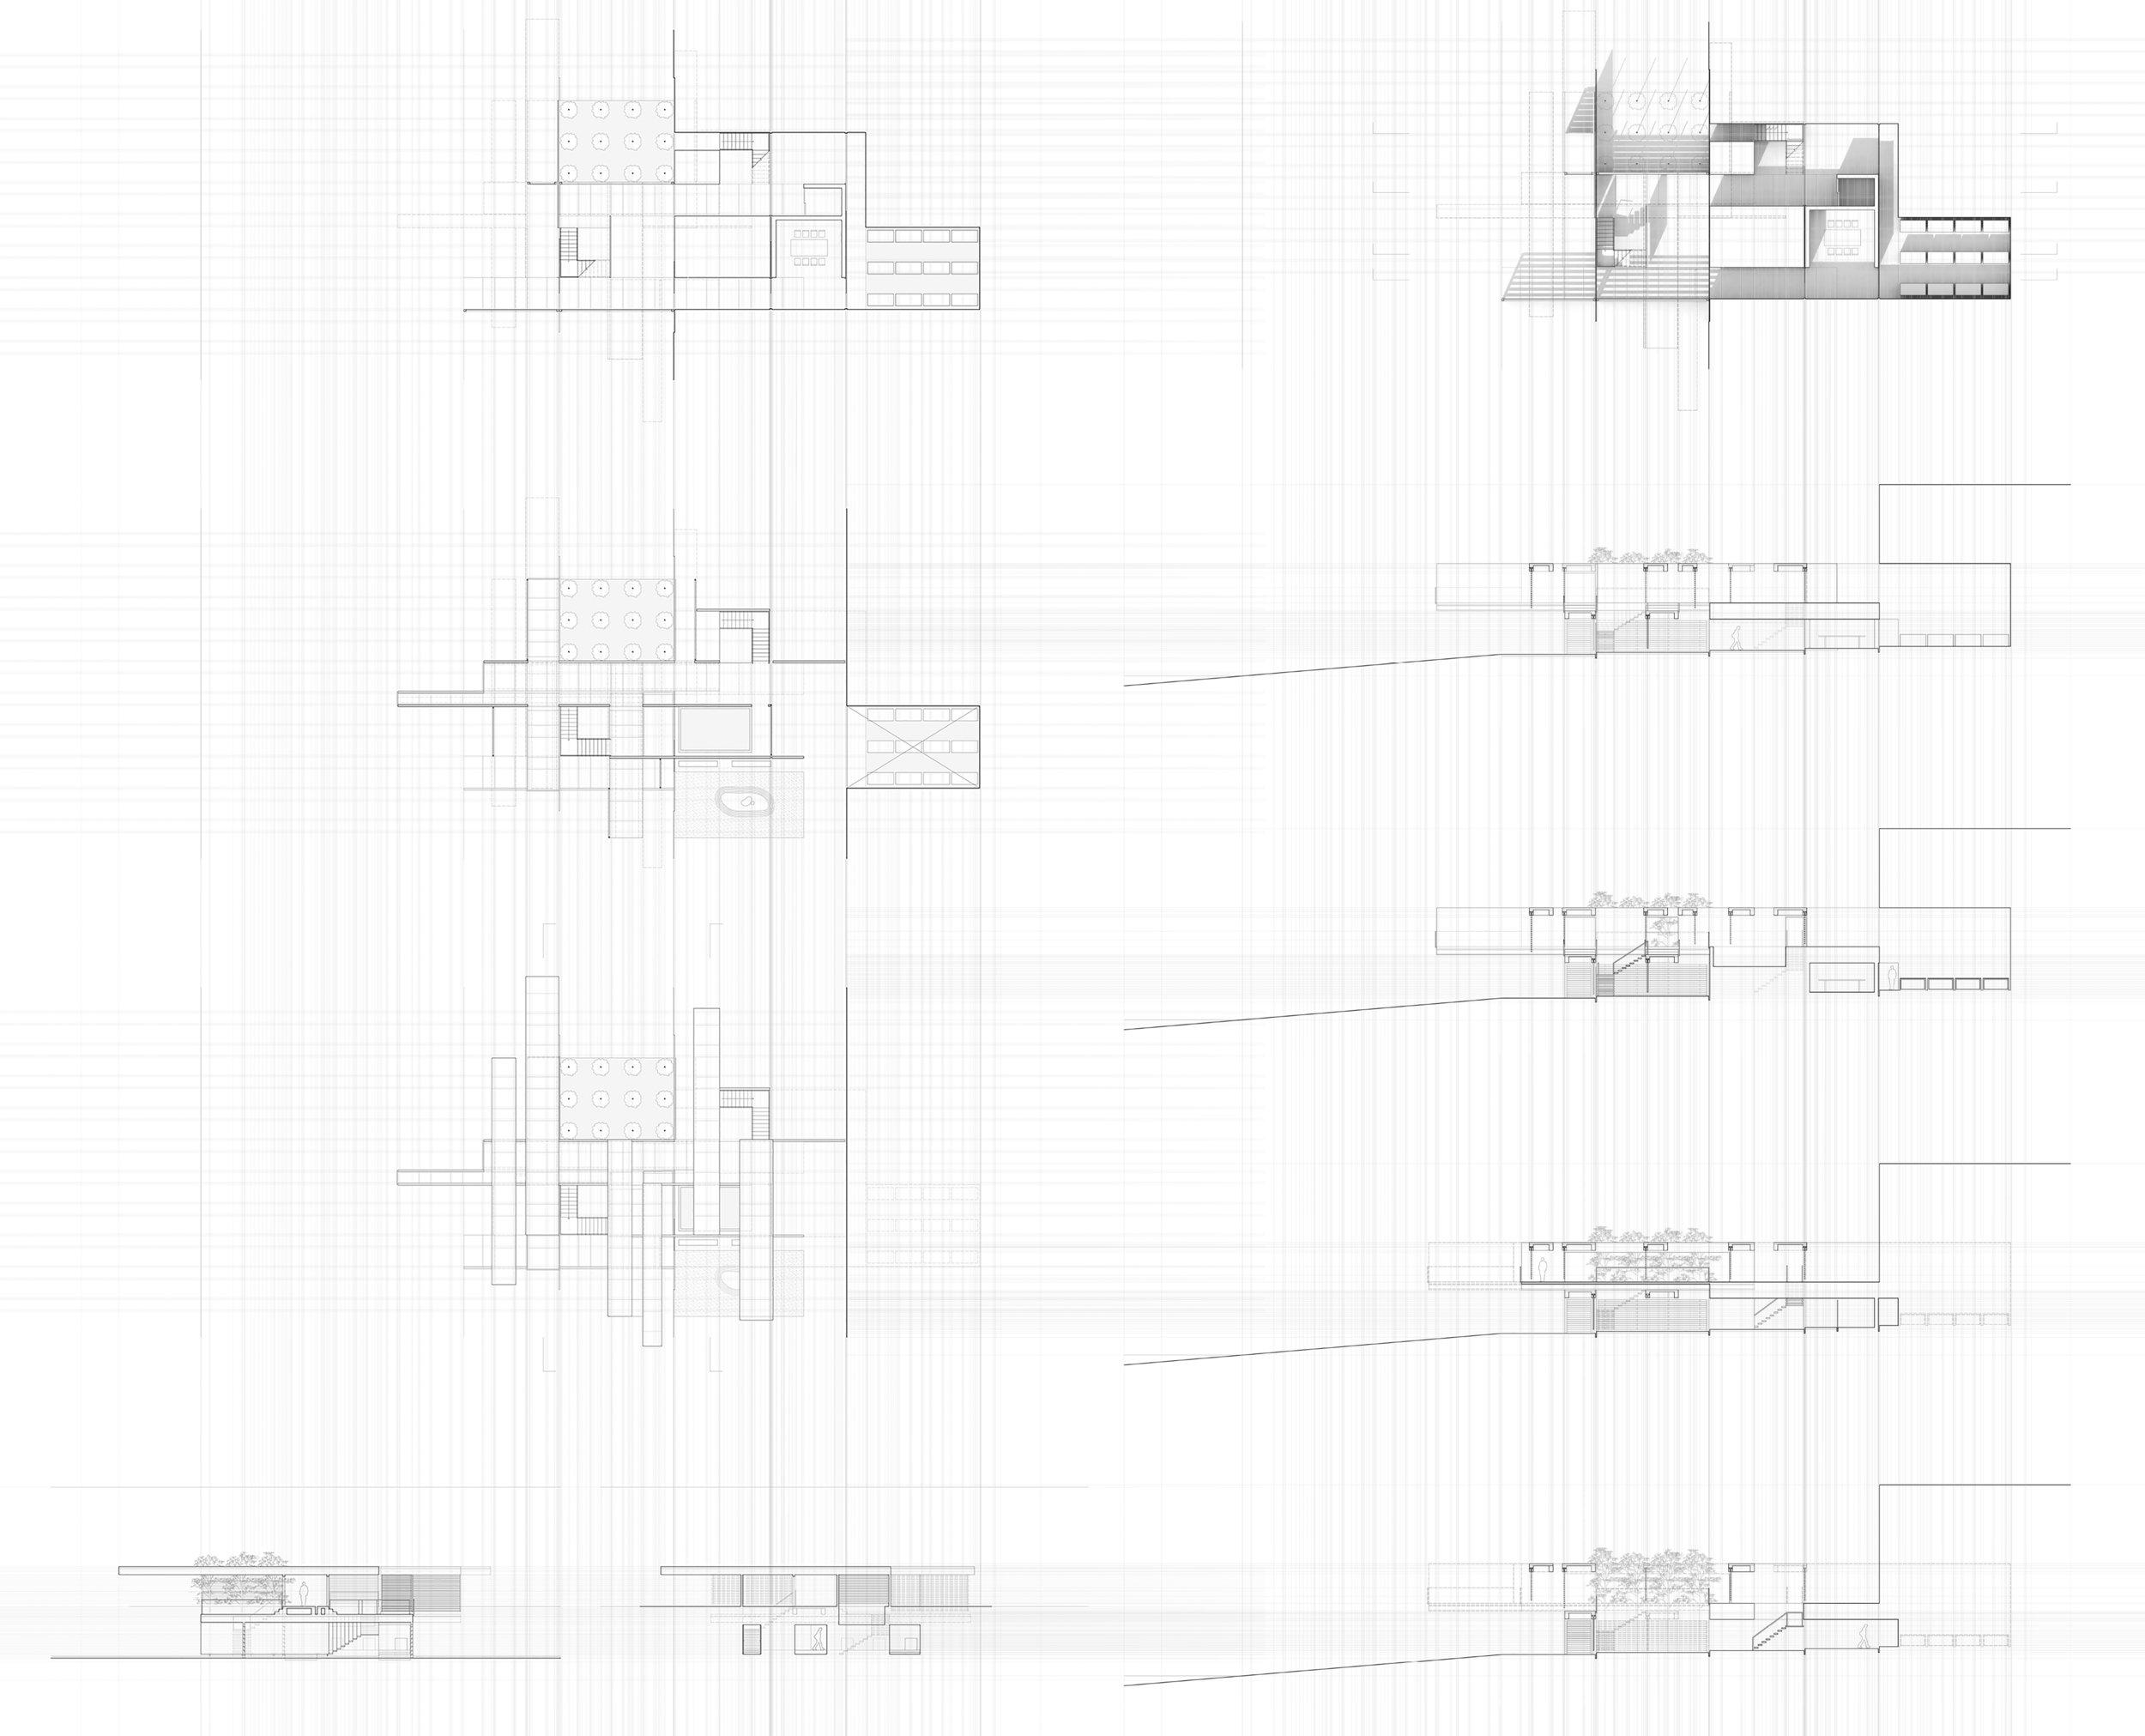 bta33_FN_Plan&Section_01.jpg